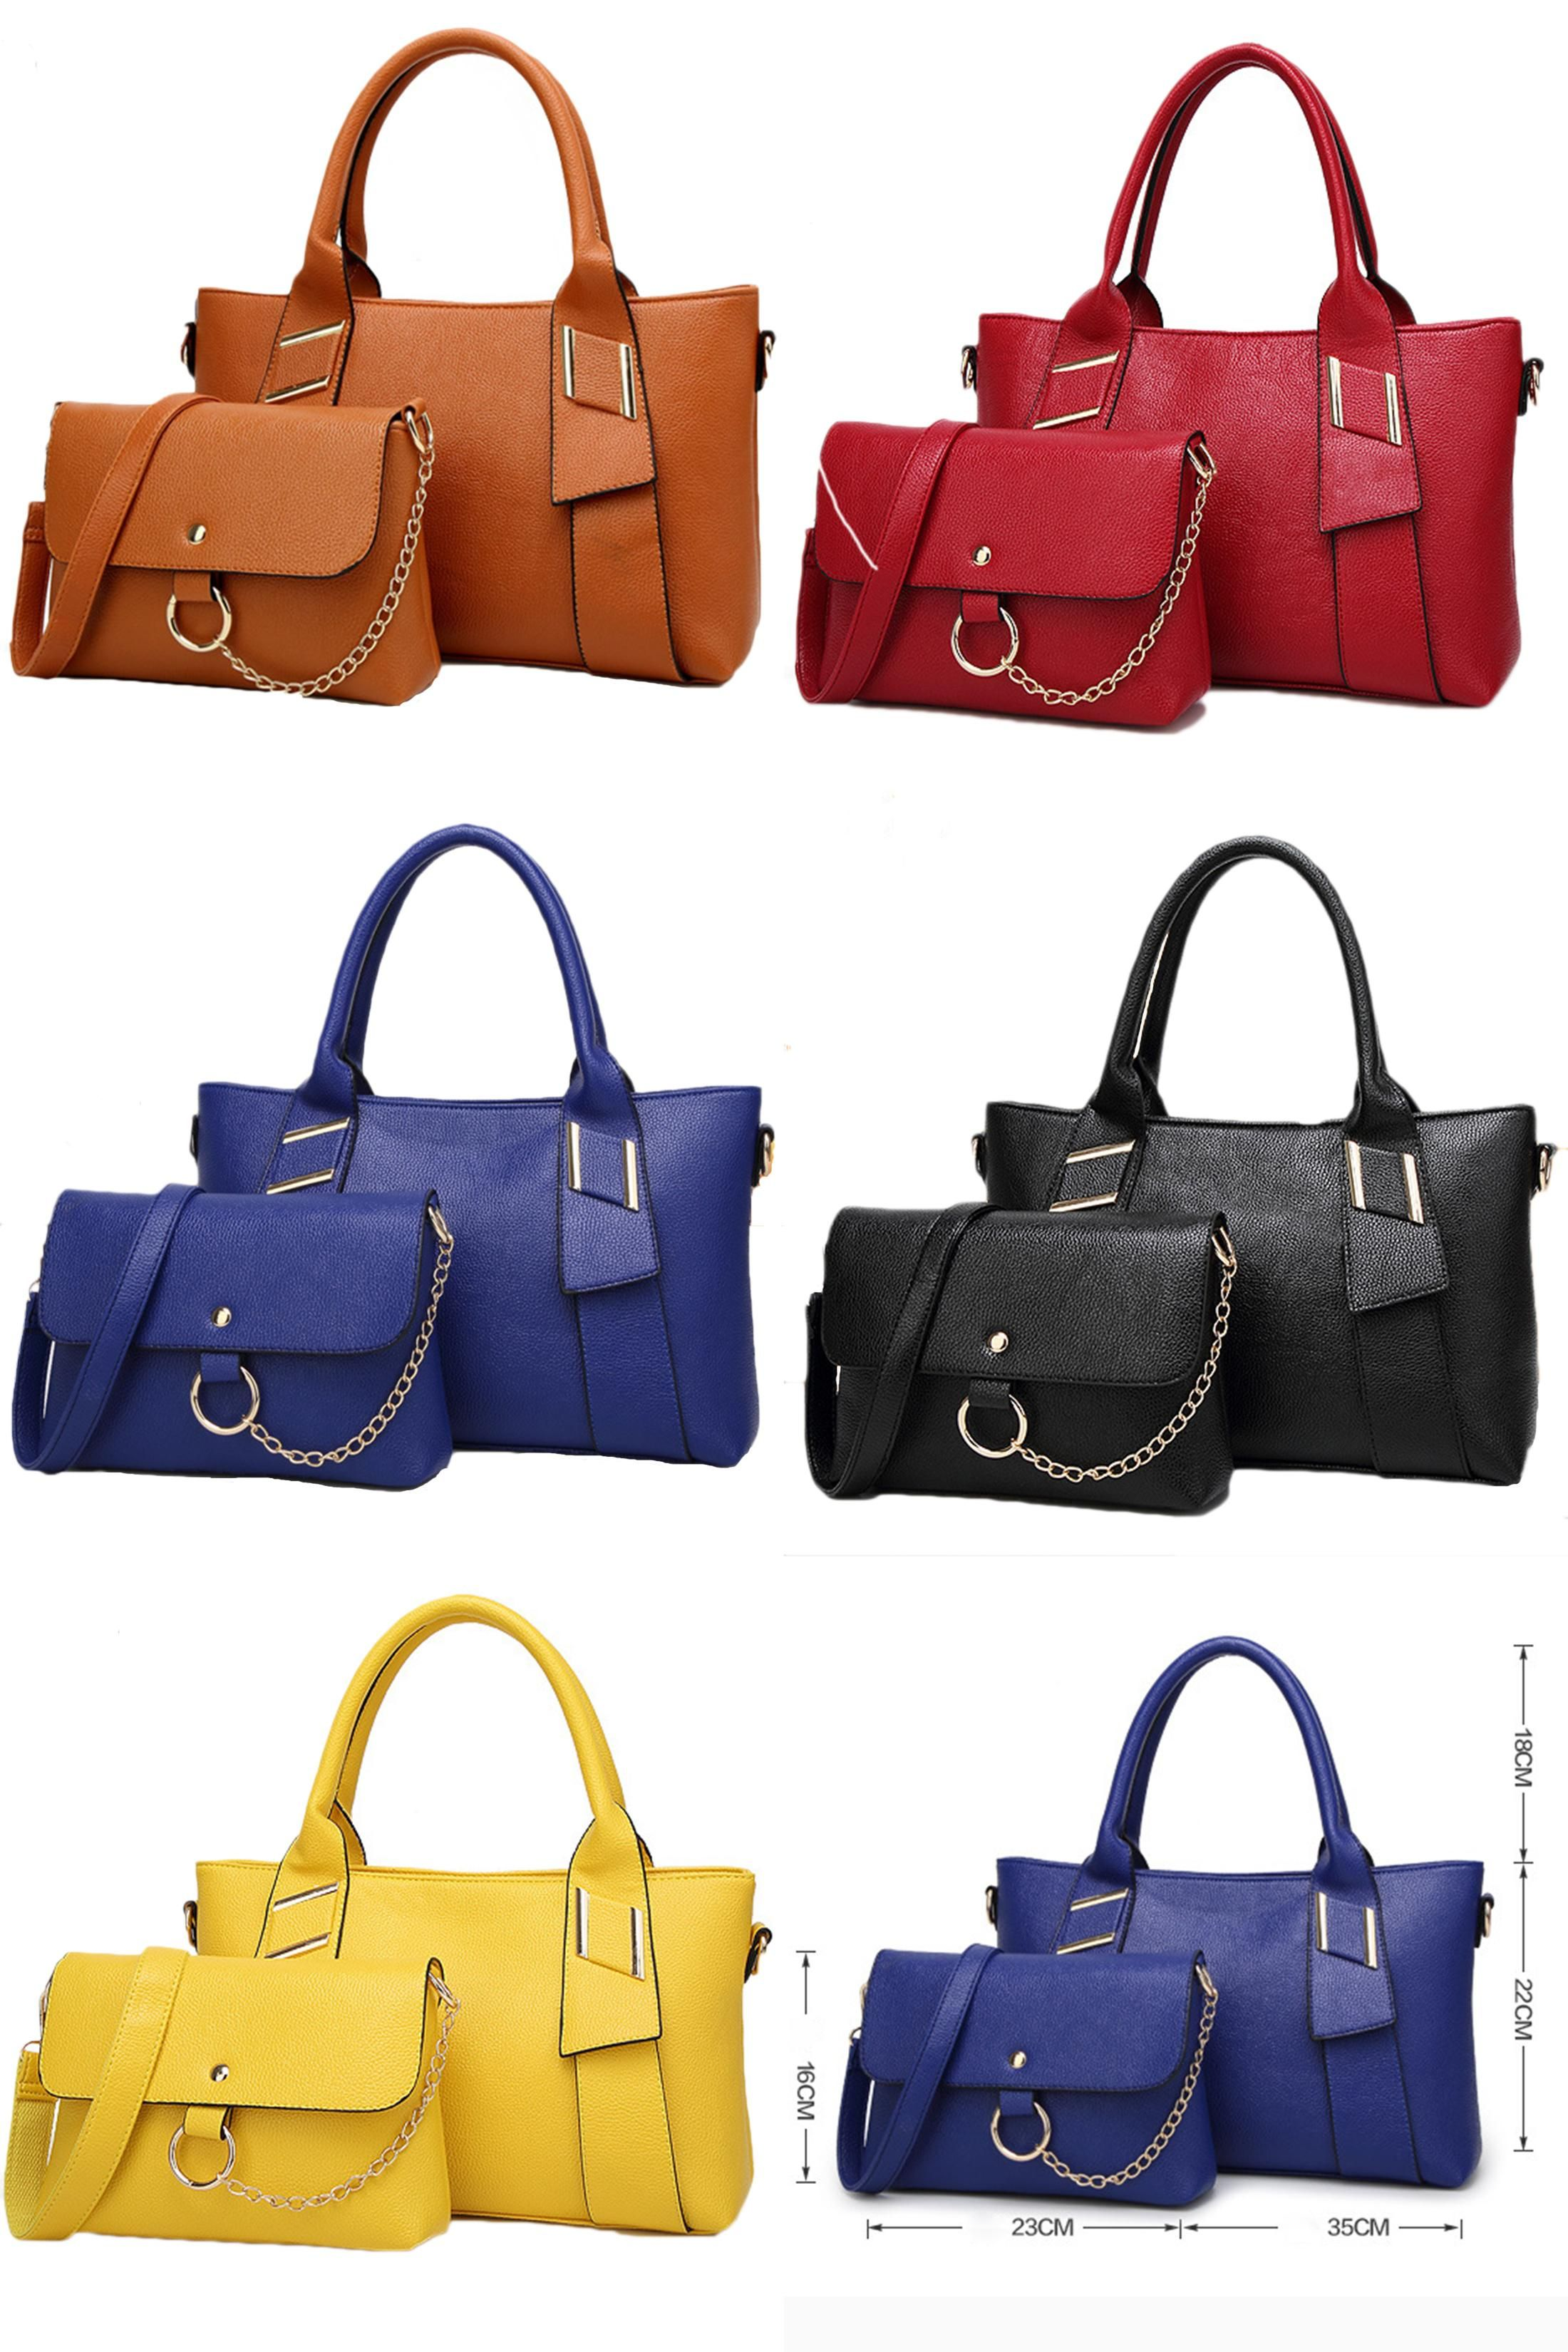 810ff98c55550 [Visit to Buy] SFG HOUSE Fashion 2017 Women 2 Piece Set Large Tote Bag  Messenger Bags Ladies PU Leather Shoulder Bag Handbags Purses Black Red #  ...